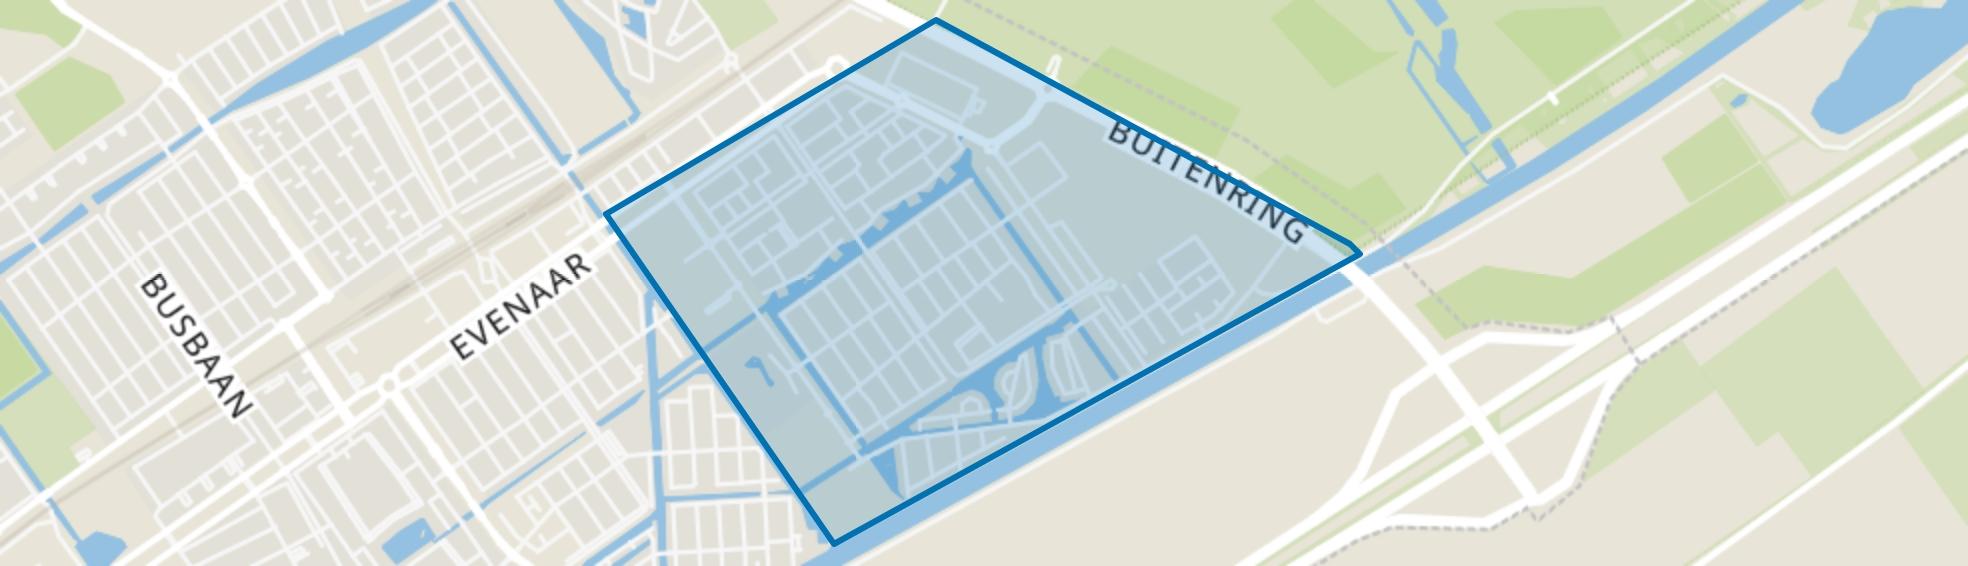 Stripheldenbuurt, Almere map